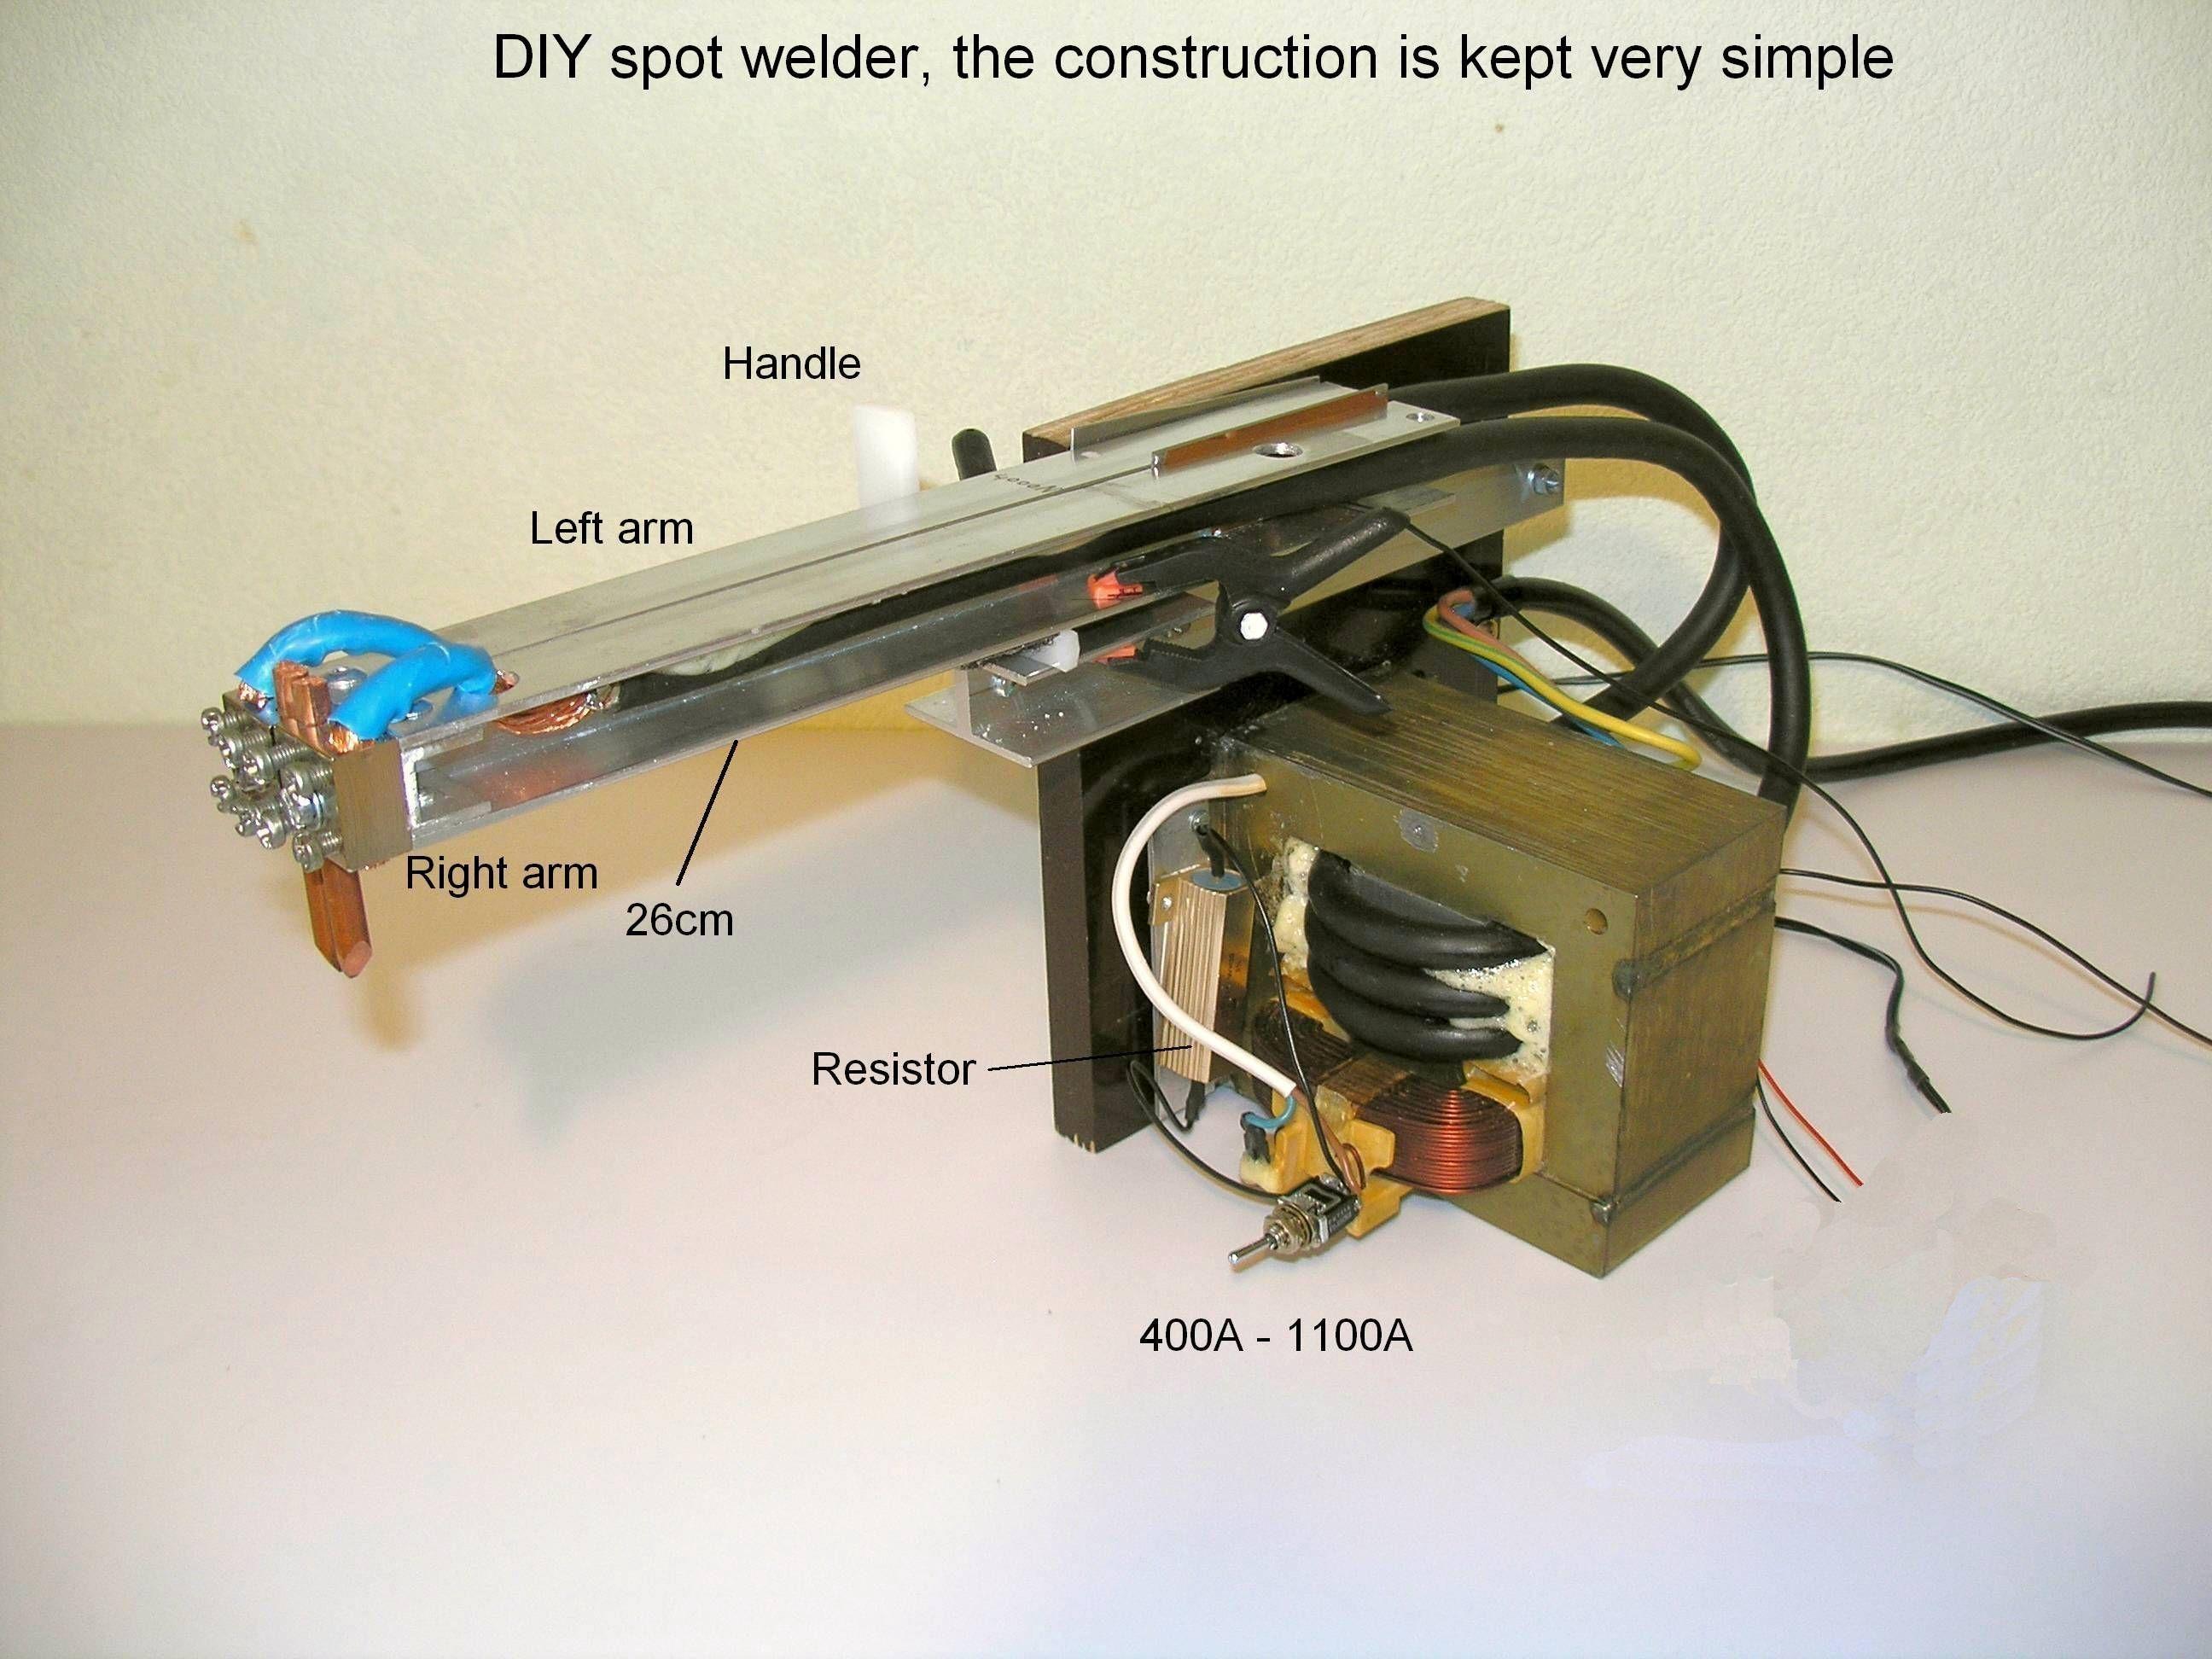 Dual Wall Switch Wiring Diagram Diy Spot Welder